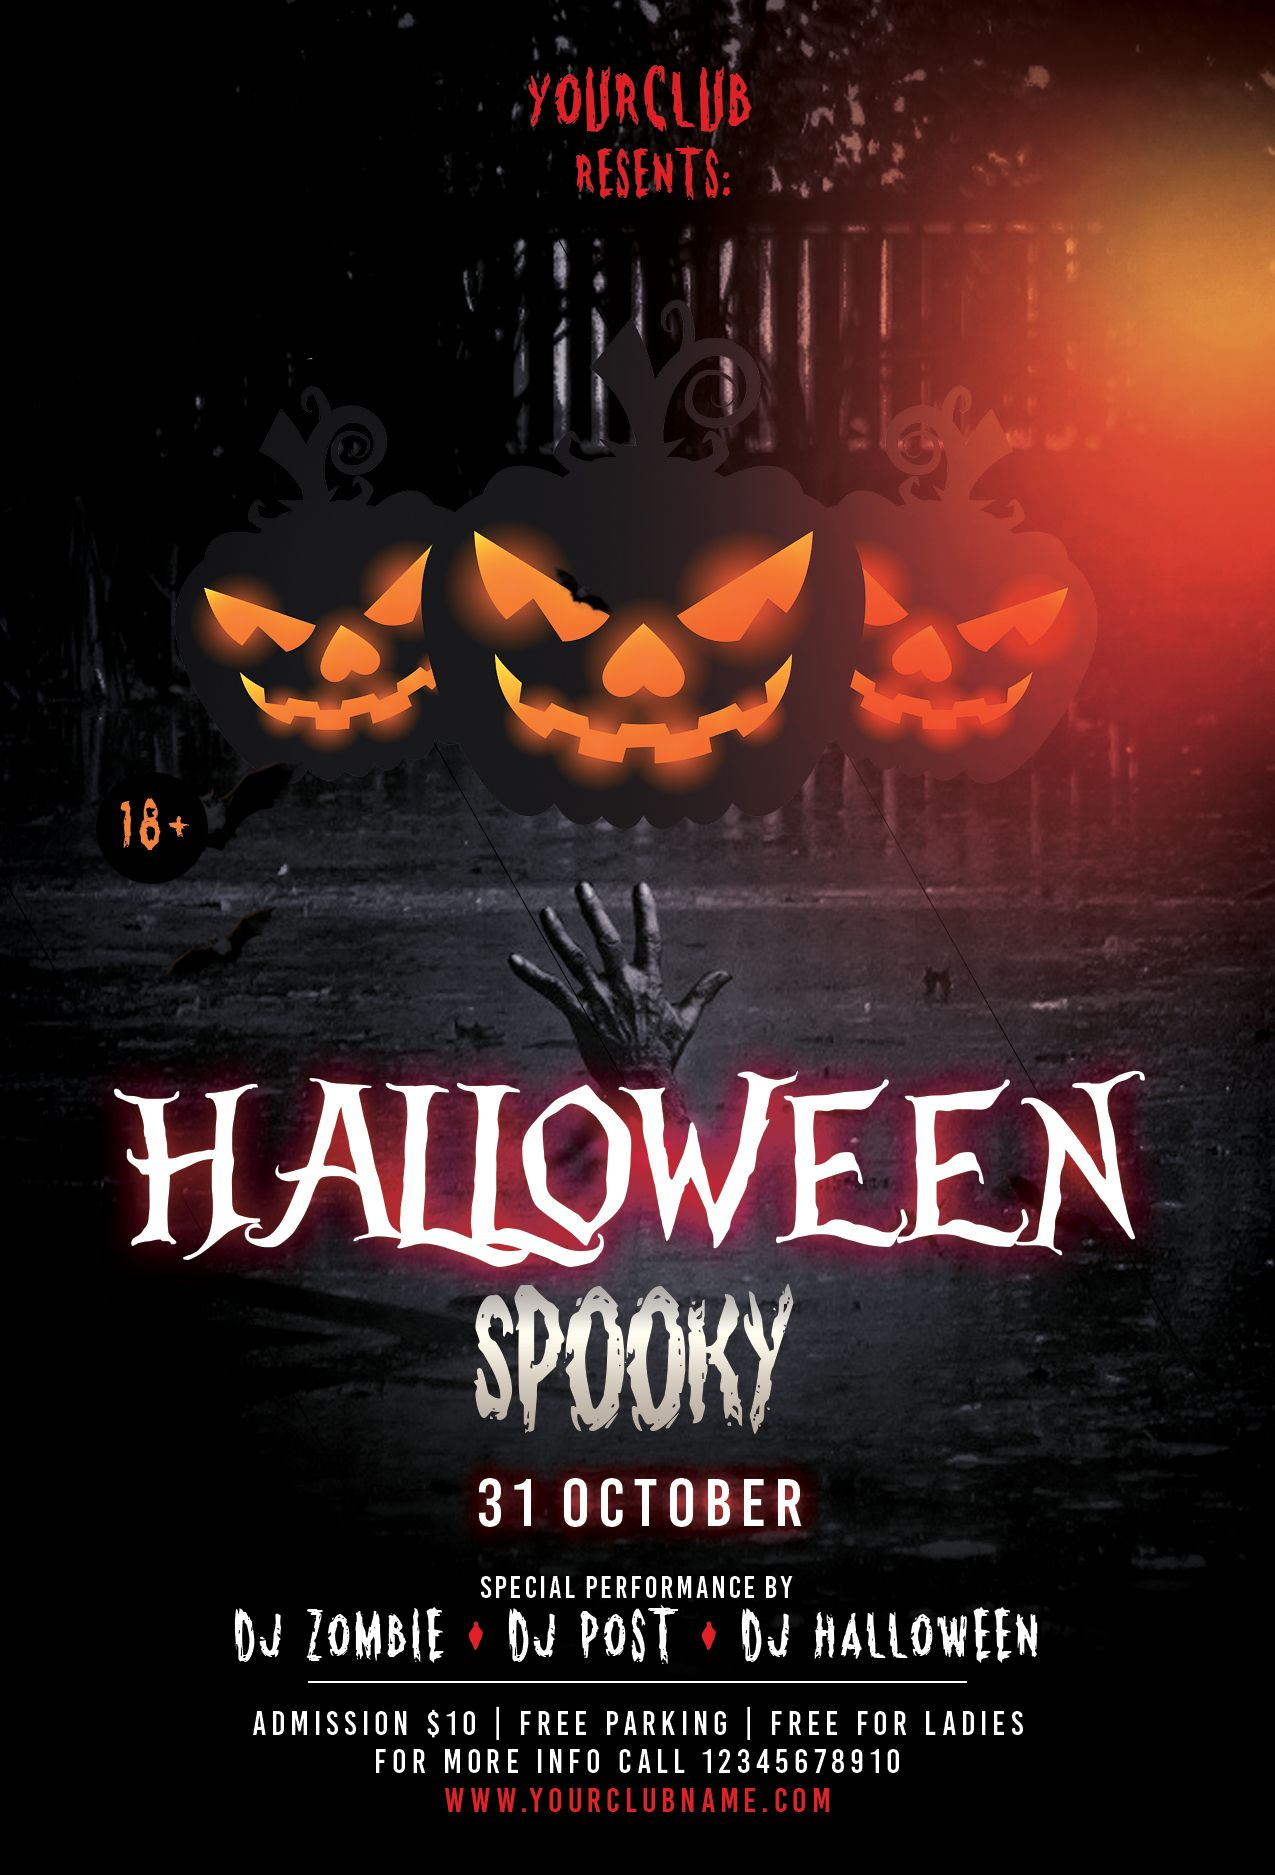 Halloween Spooky Download Free PSD Flyer Template Freeflyer Psd